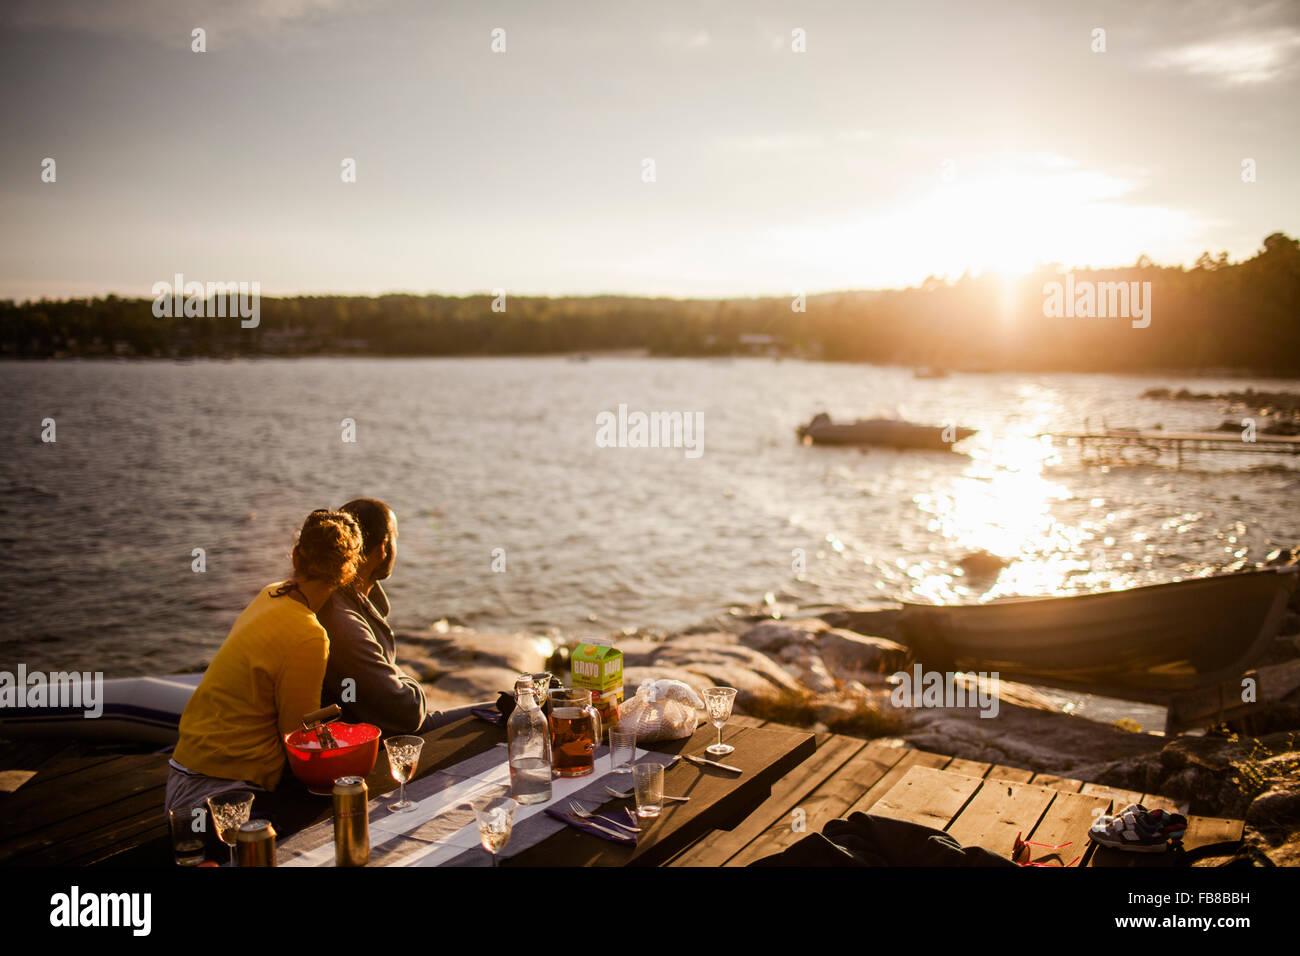 Suecia, Medelpad, Alnon, Pareja mirando atardecer Imagen De Stock